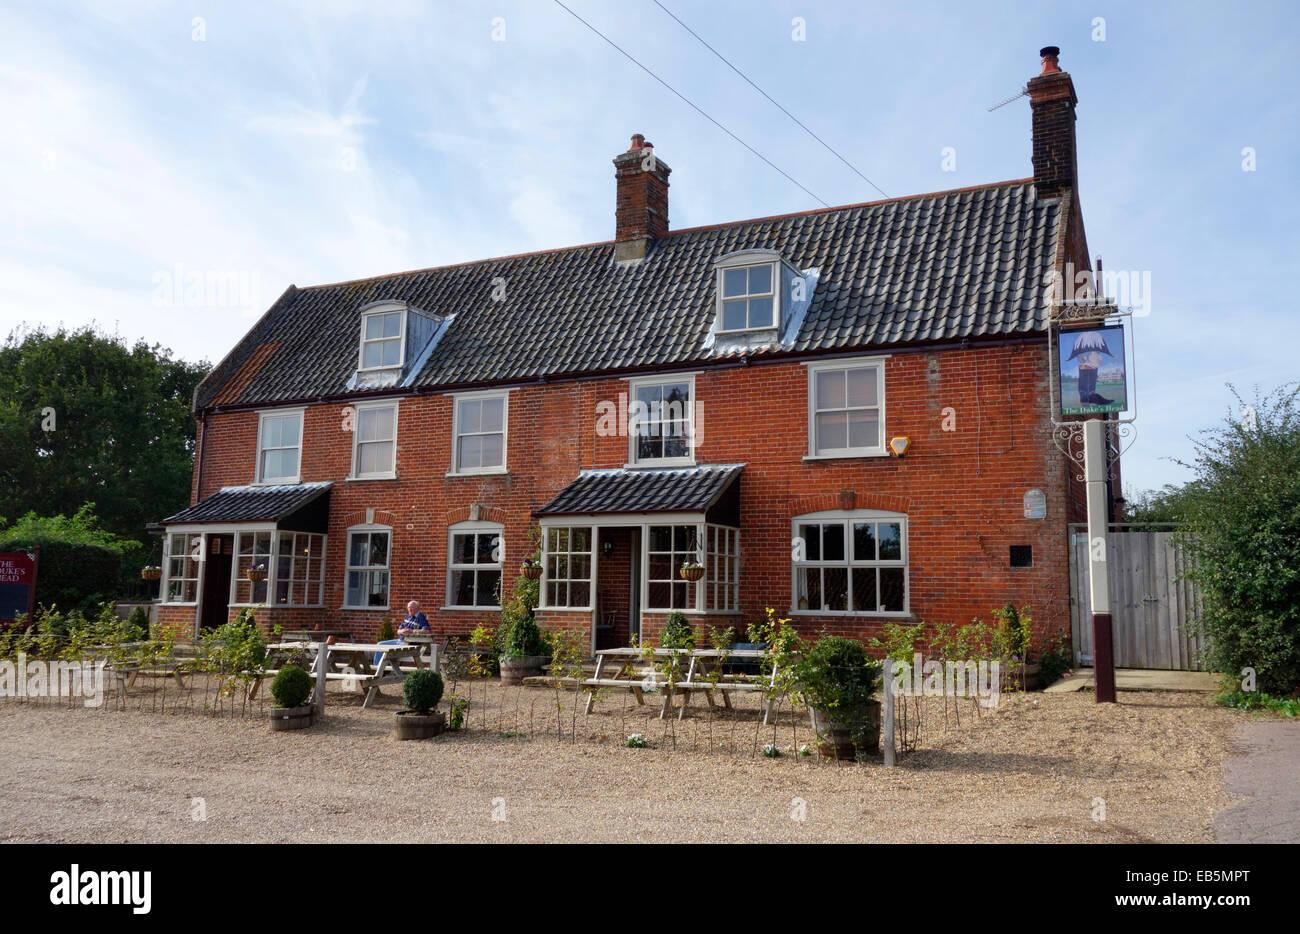 The Duke's Head pub, Somerleyton - Stock Image